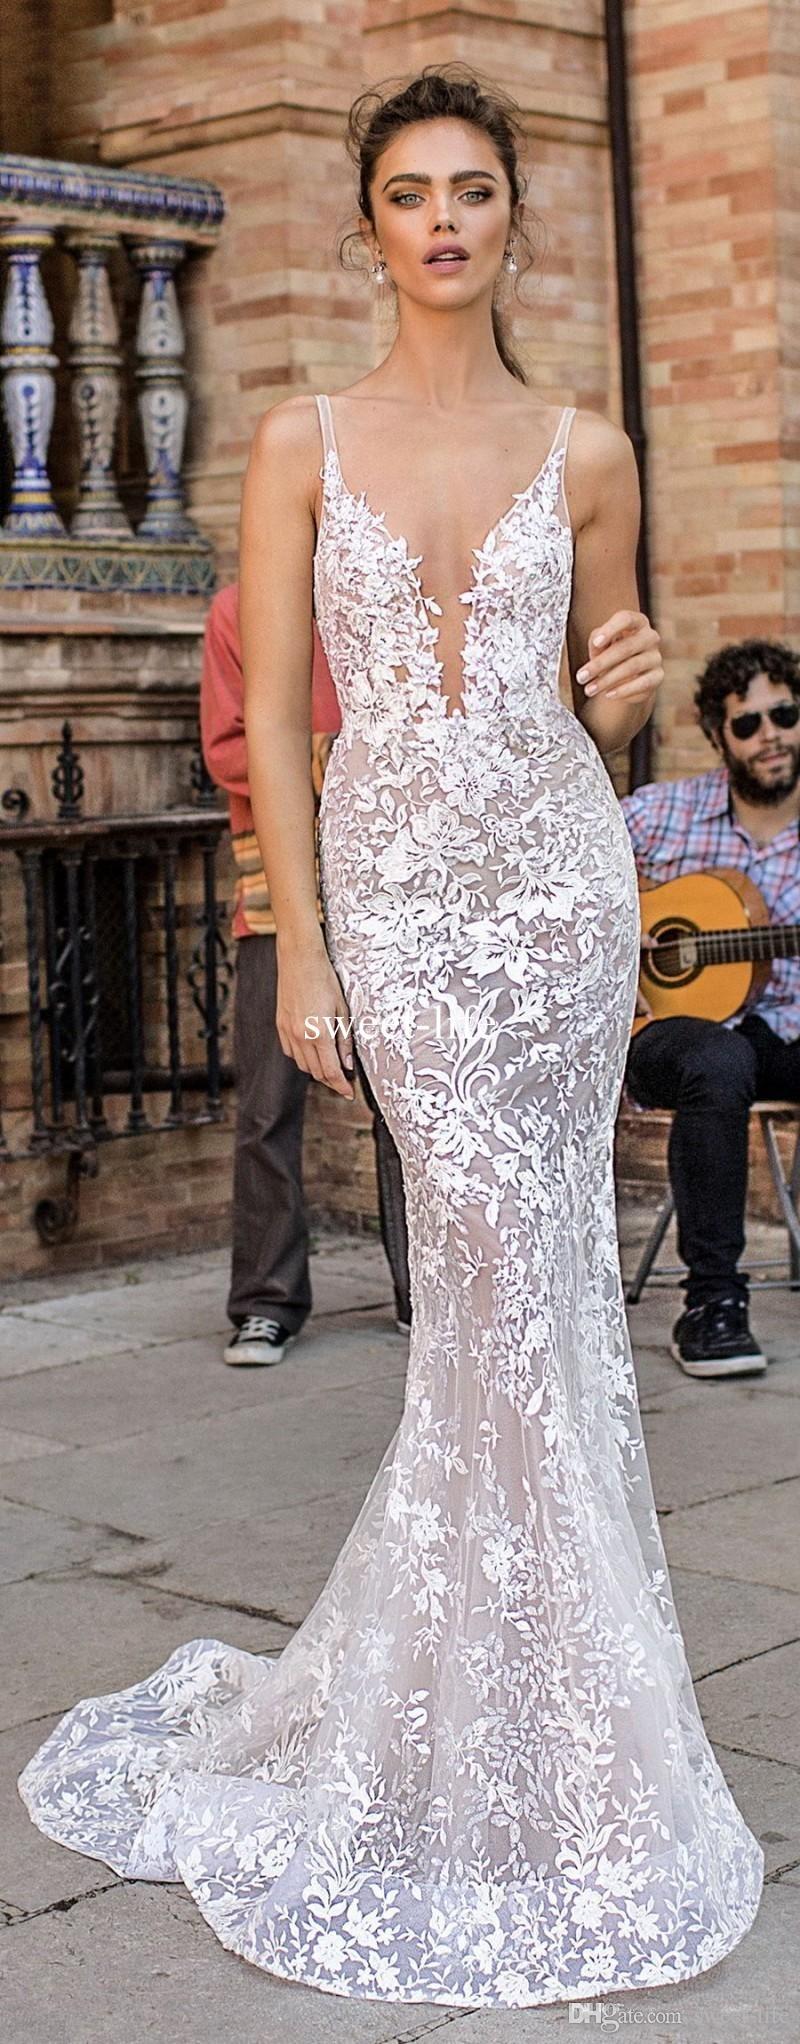 2020 Berta Novia Sirena Vestidos de novia sin espalda Espagueti sexy Escote en V Apliques de encaje completo Trompeta Tallas grandes Vestidos de novia por encargo